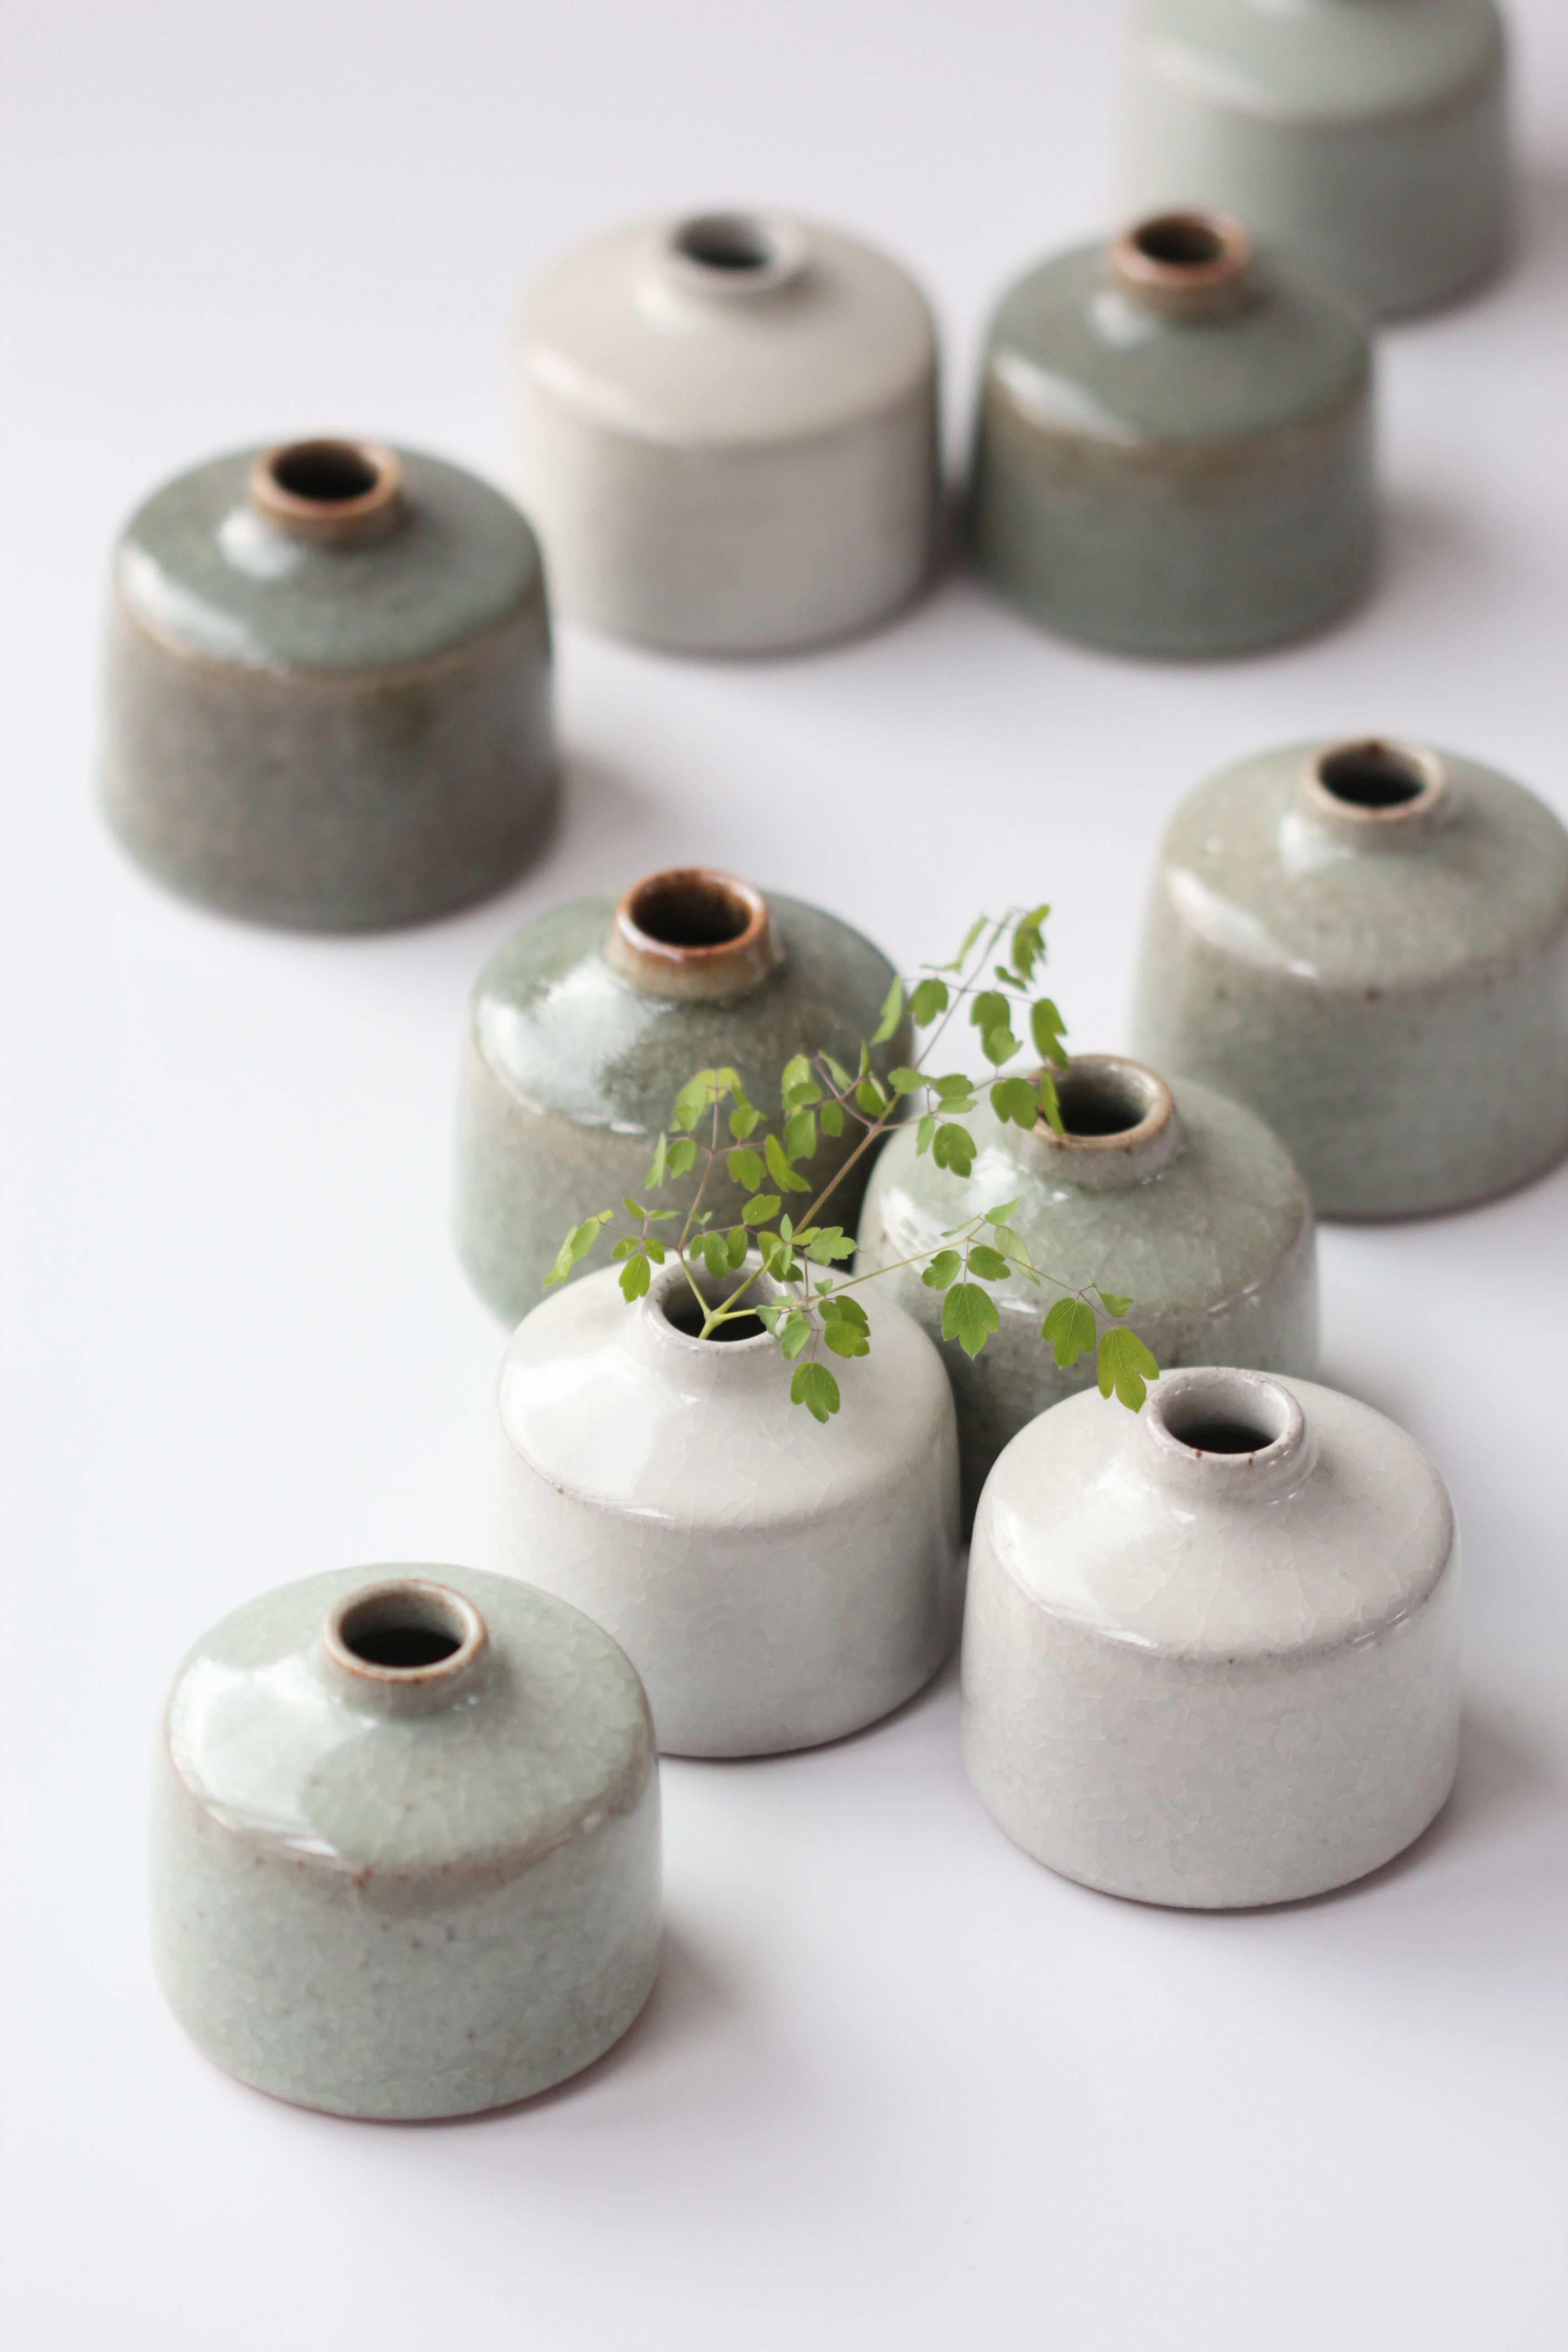 17+ Lovely Ceramic Vases Art Ideas is part of Ceramic vase, Ceramic vases, Glaze ceramics, Glass vase decor, Ceramic pottery, Pottery vase - Beauteous Ceramic Vases Art Ideas 17+ Lovely Ceramic Vases Art Ideas